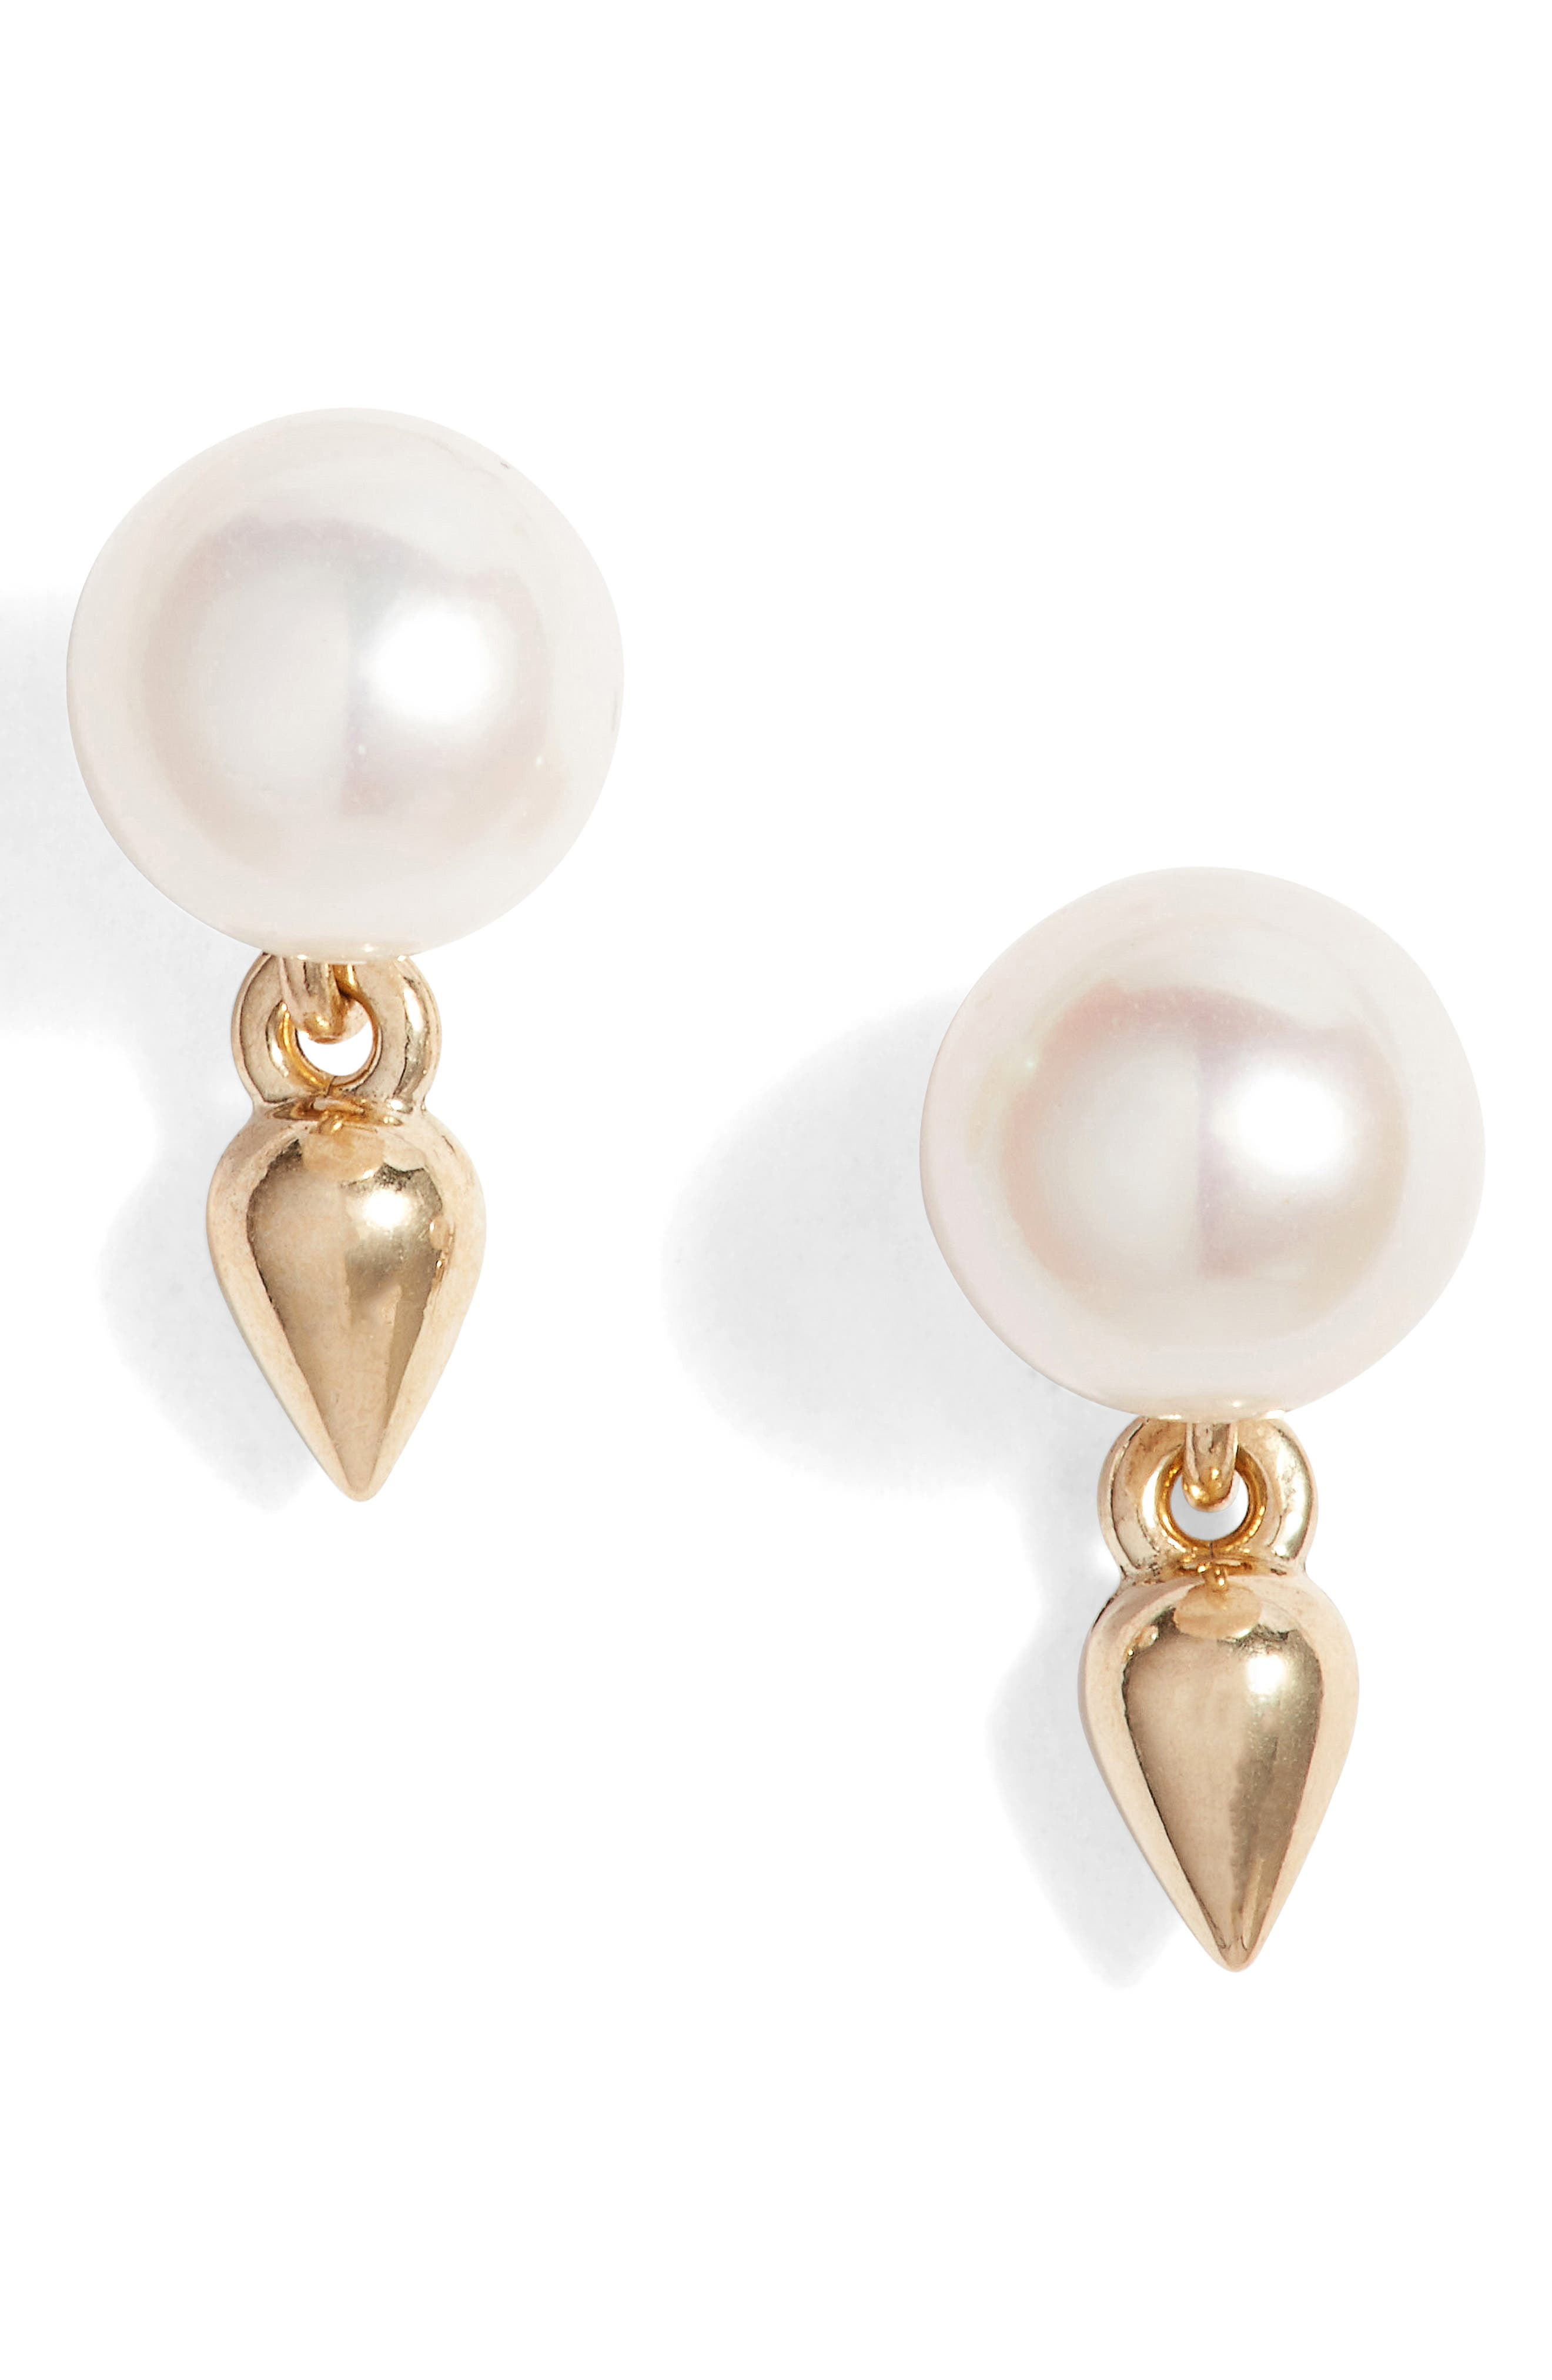 Pearl Stud Earrings,                             Main thumbnail 1, color,                             Yellow Gold